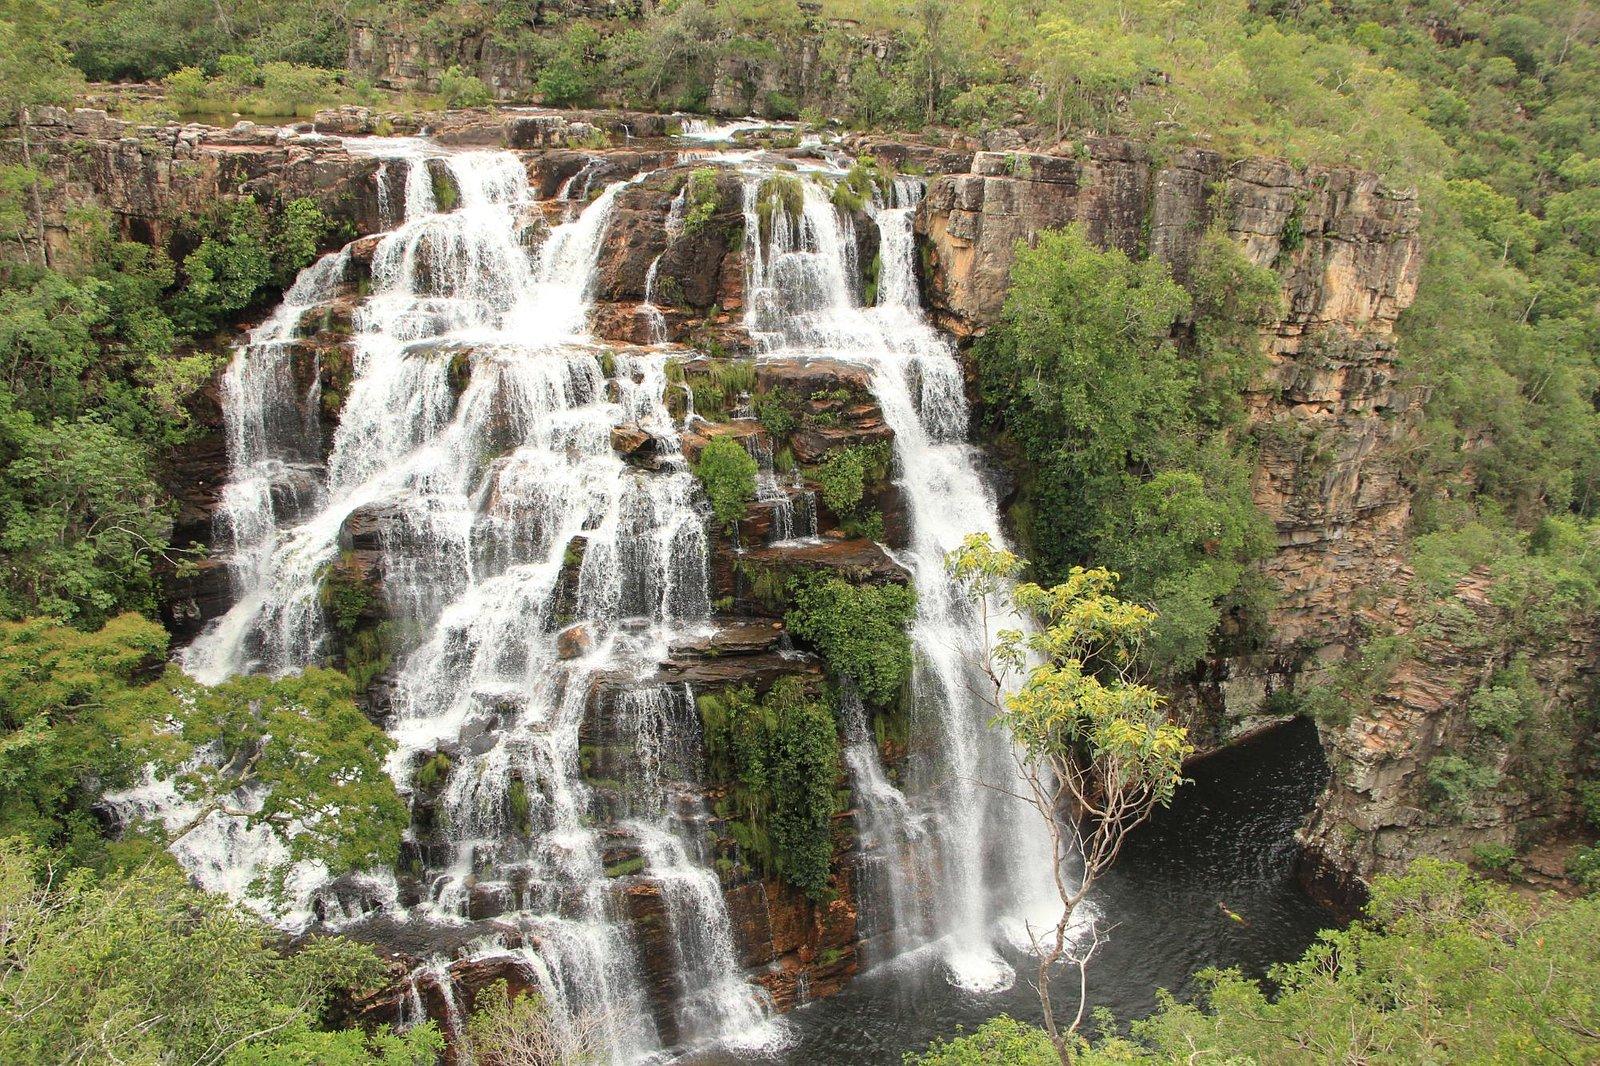 Cachoeira das Almécegas I foto: Carina Freitas